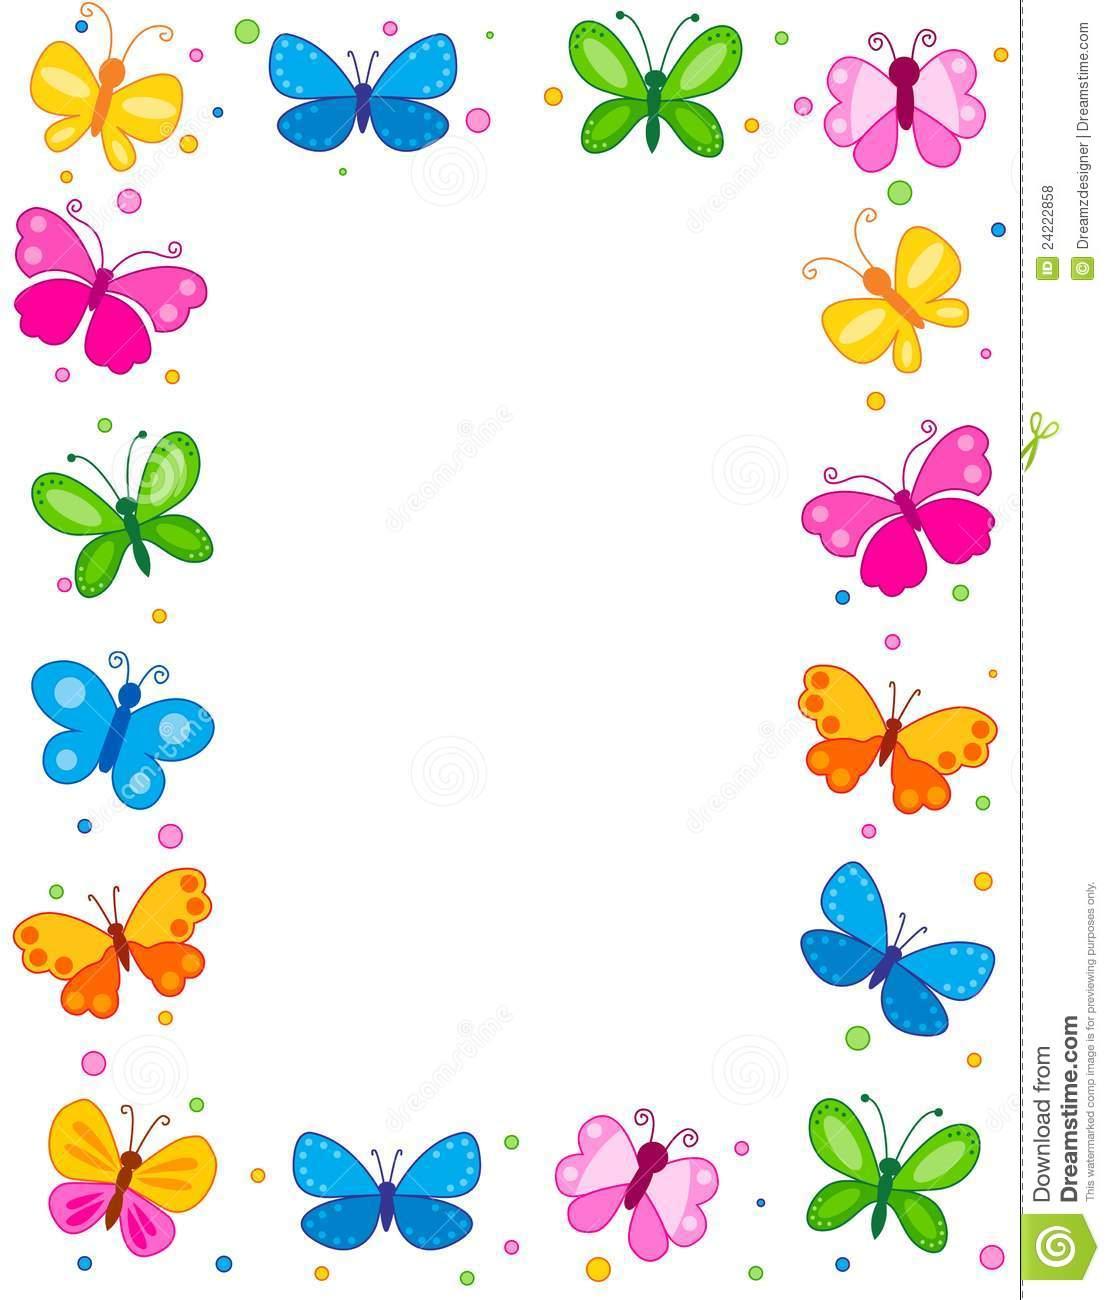 free butterfly borders